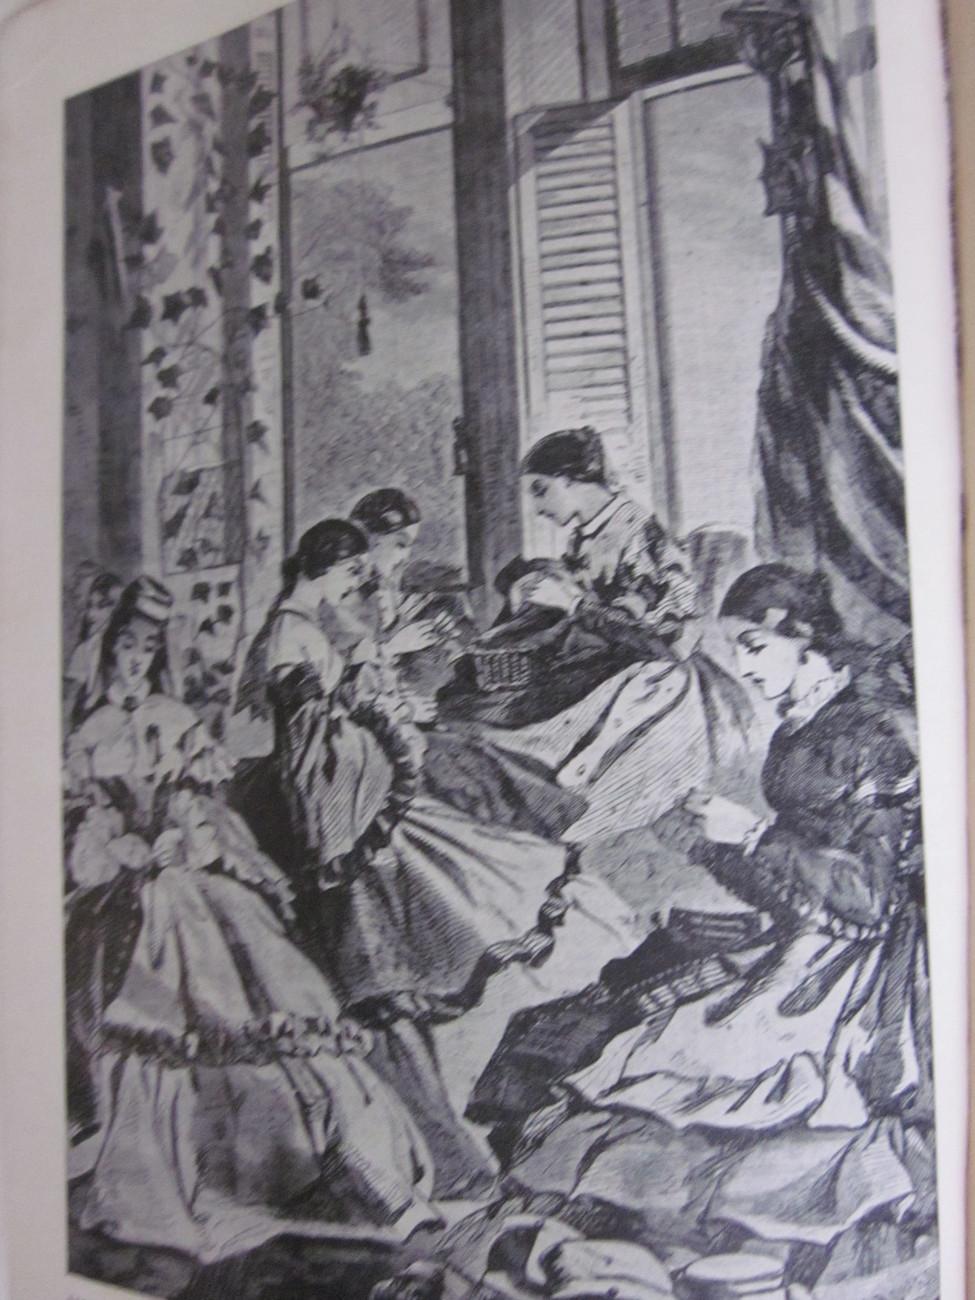 Reveille in Washington 1860 - 1865 by M. Leech Vintage Book